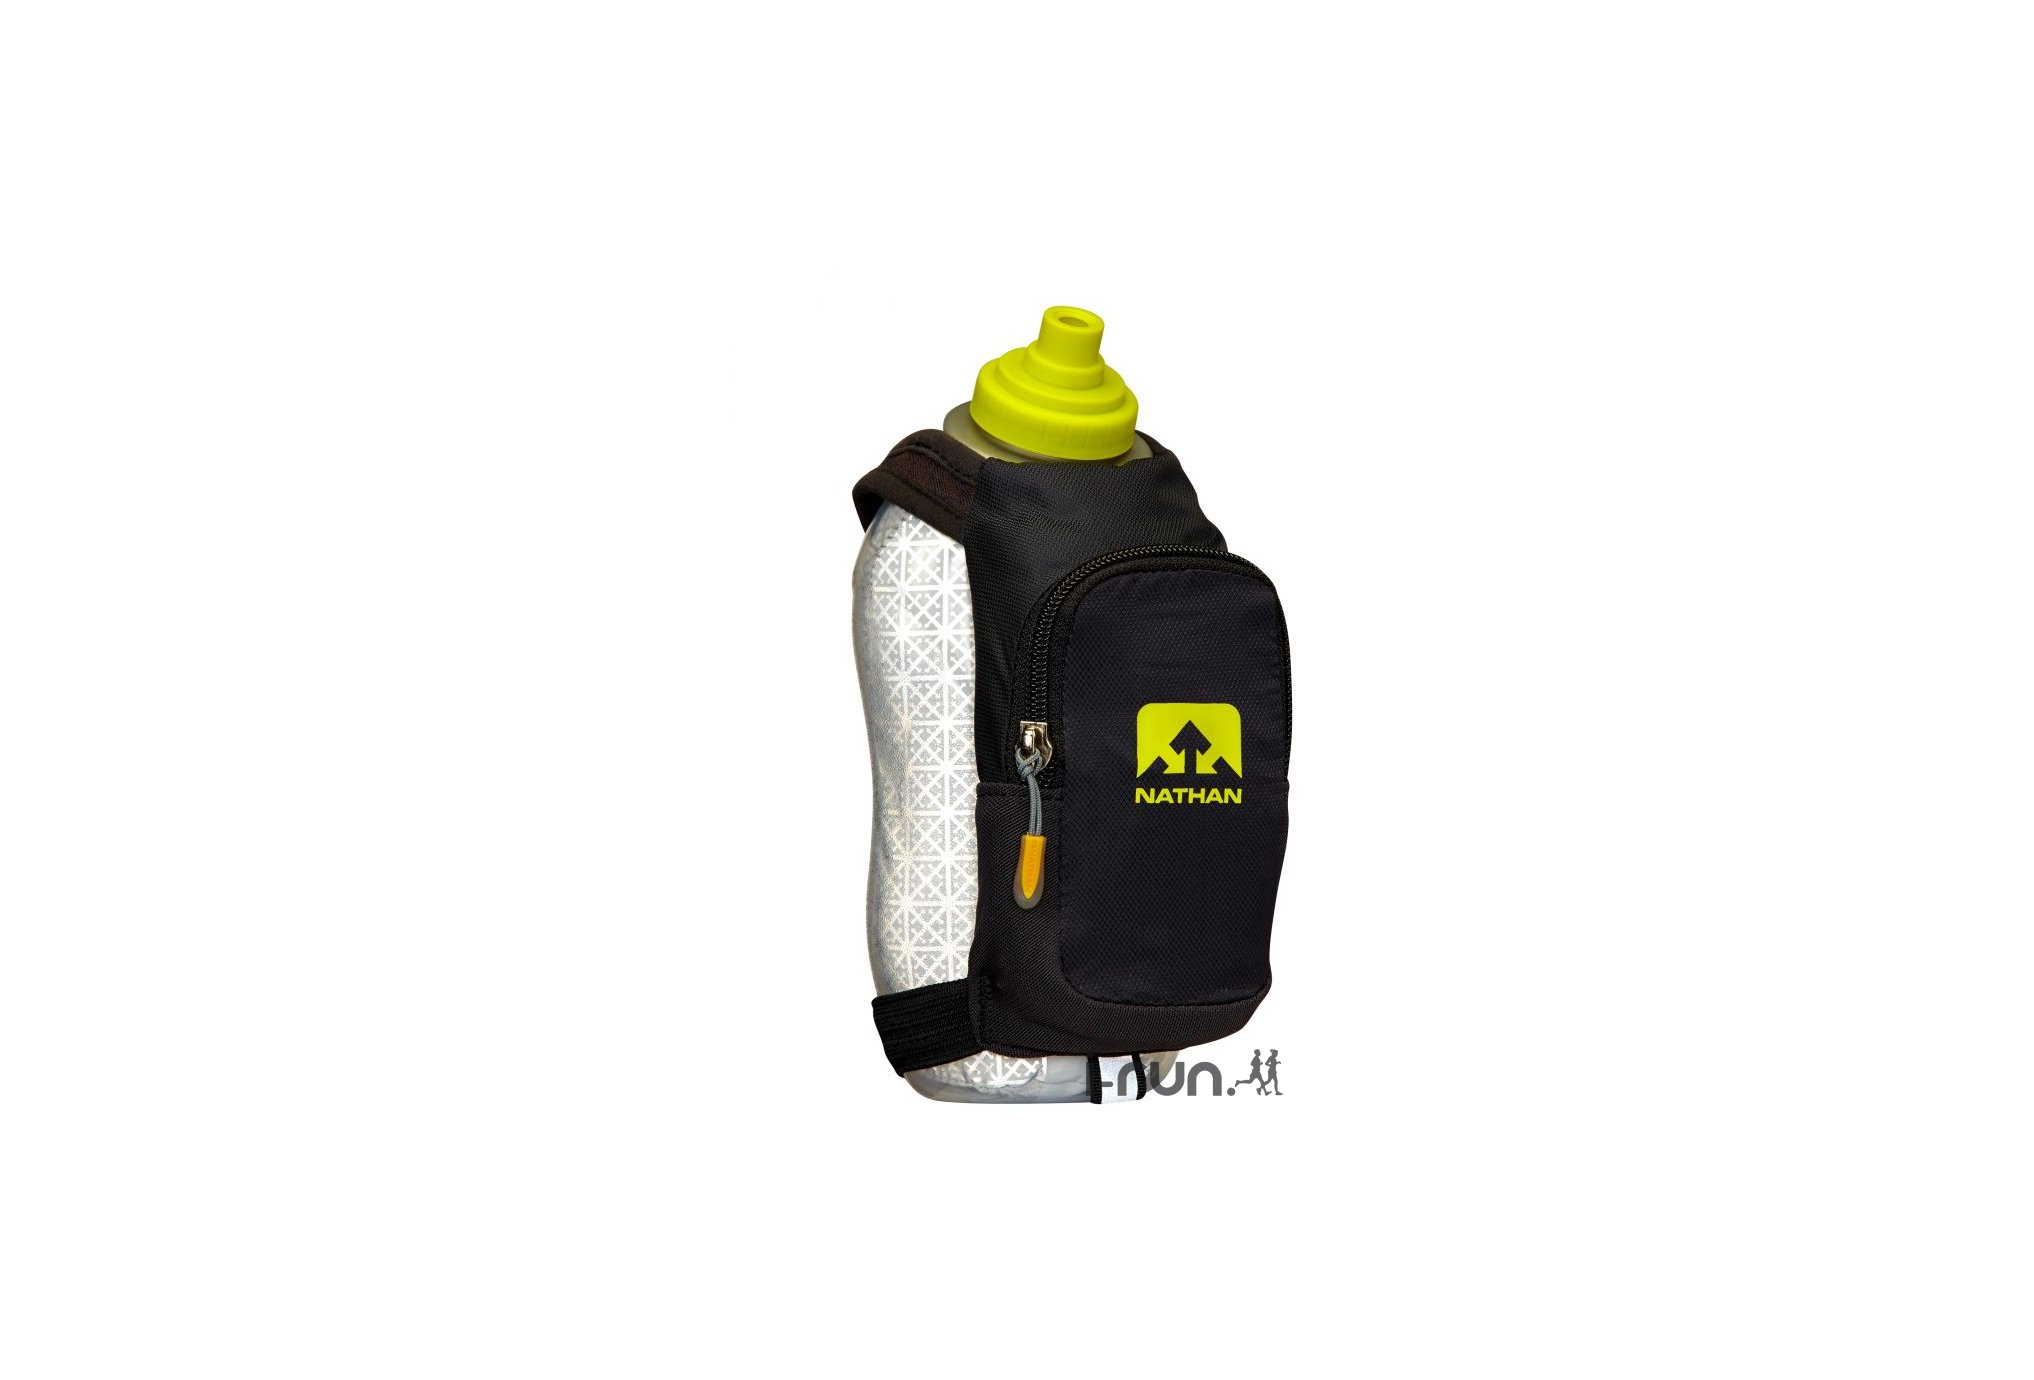 Nathan Porte bidon speeddraw plus insulated hydratation / sacs à dos